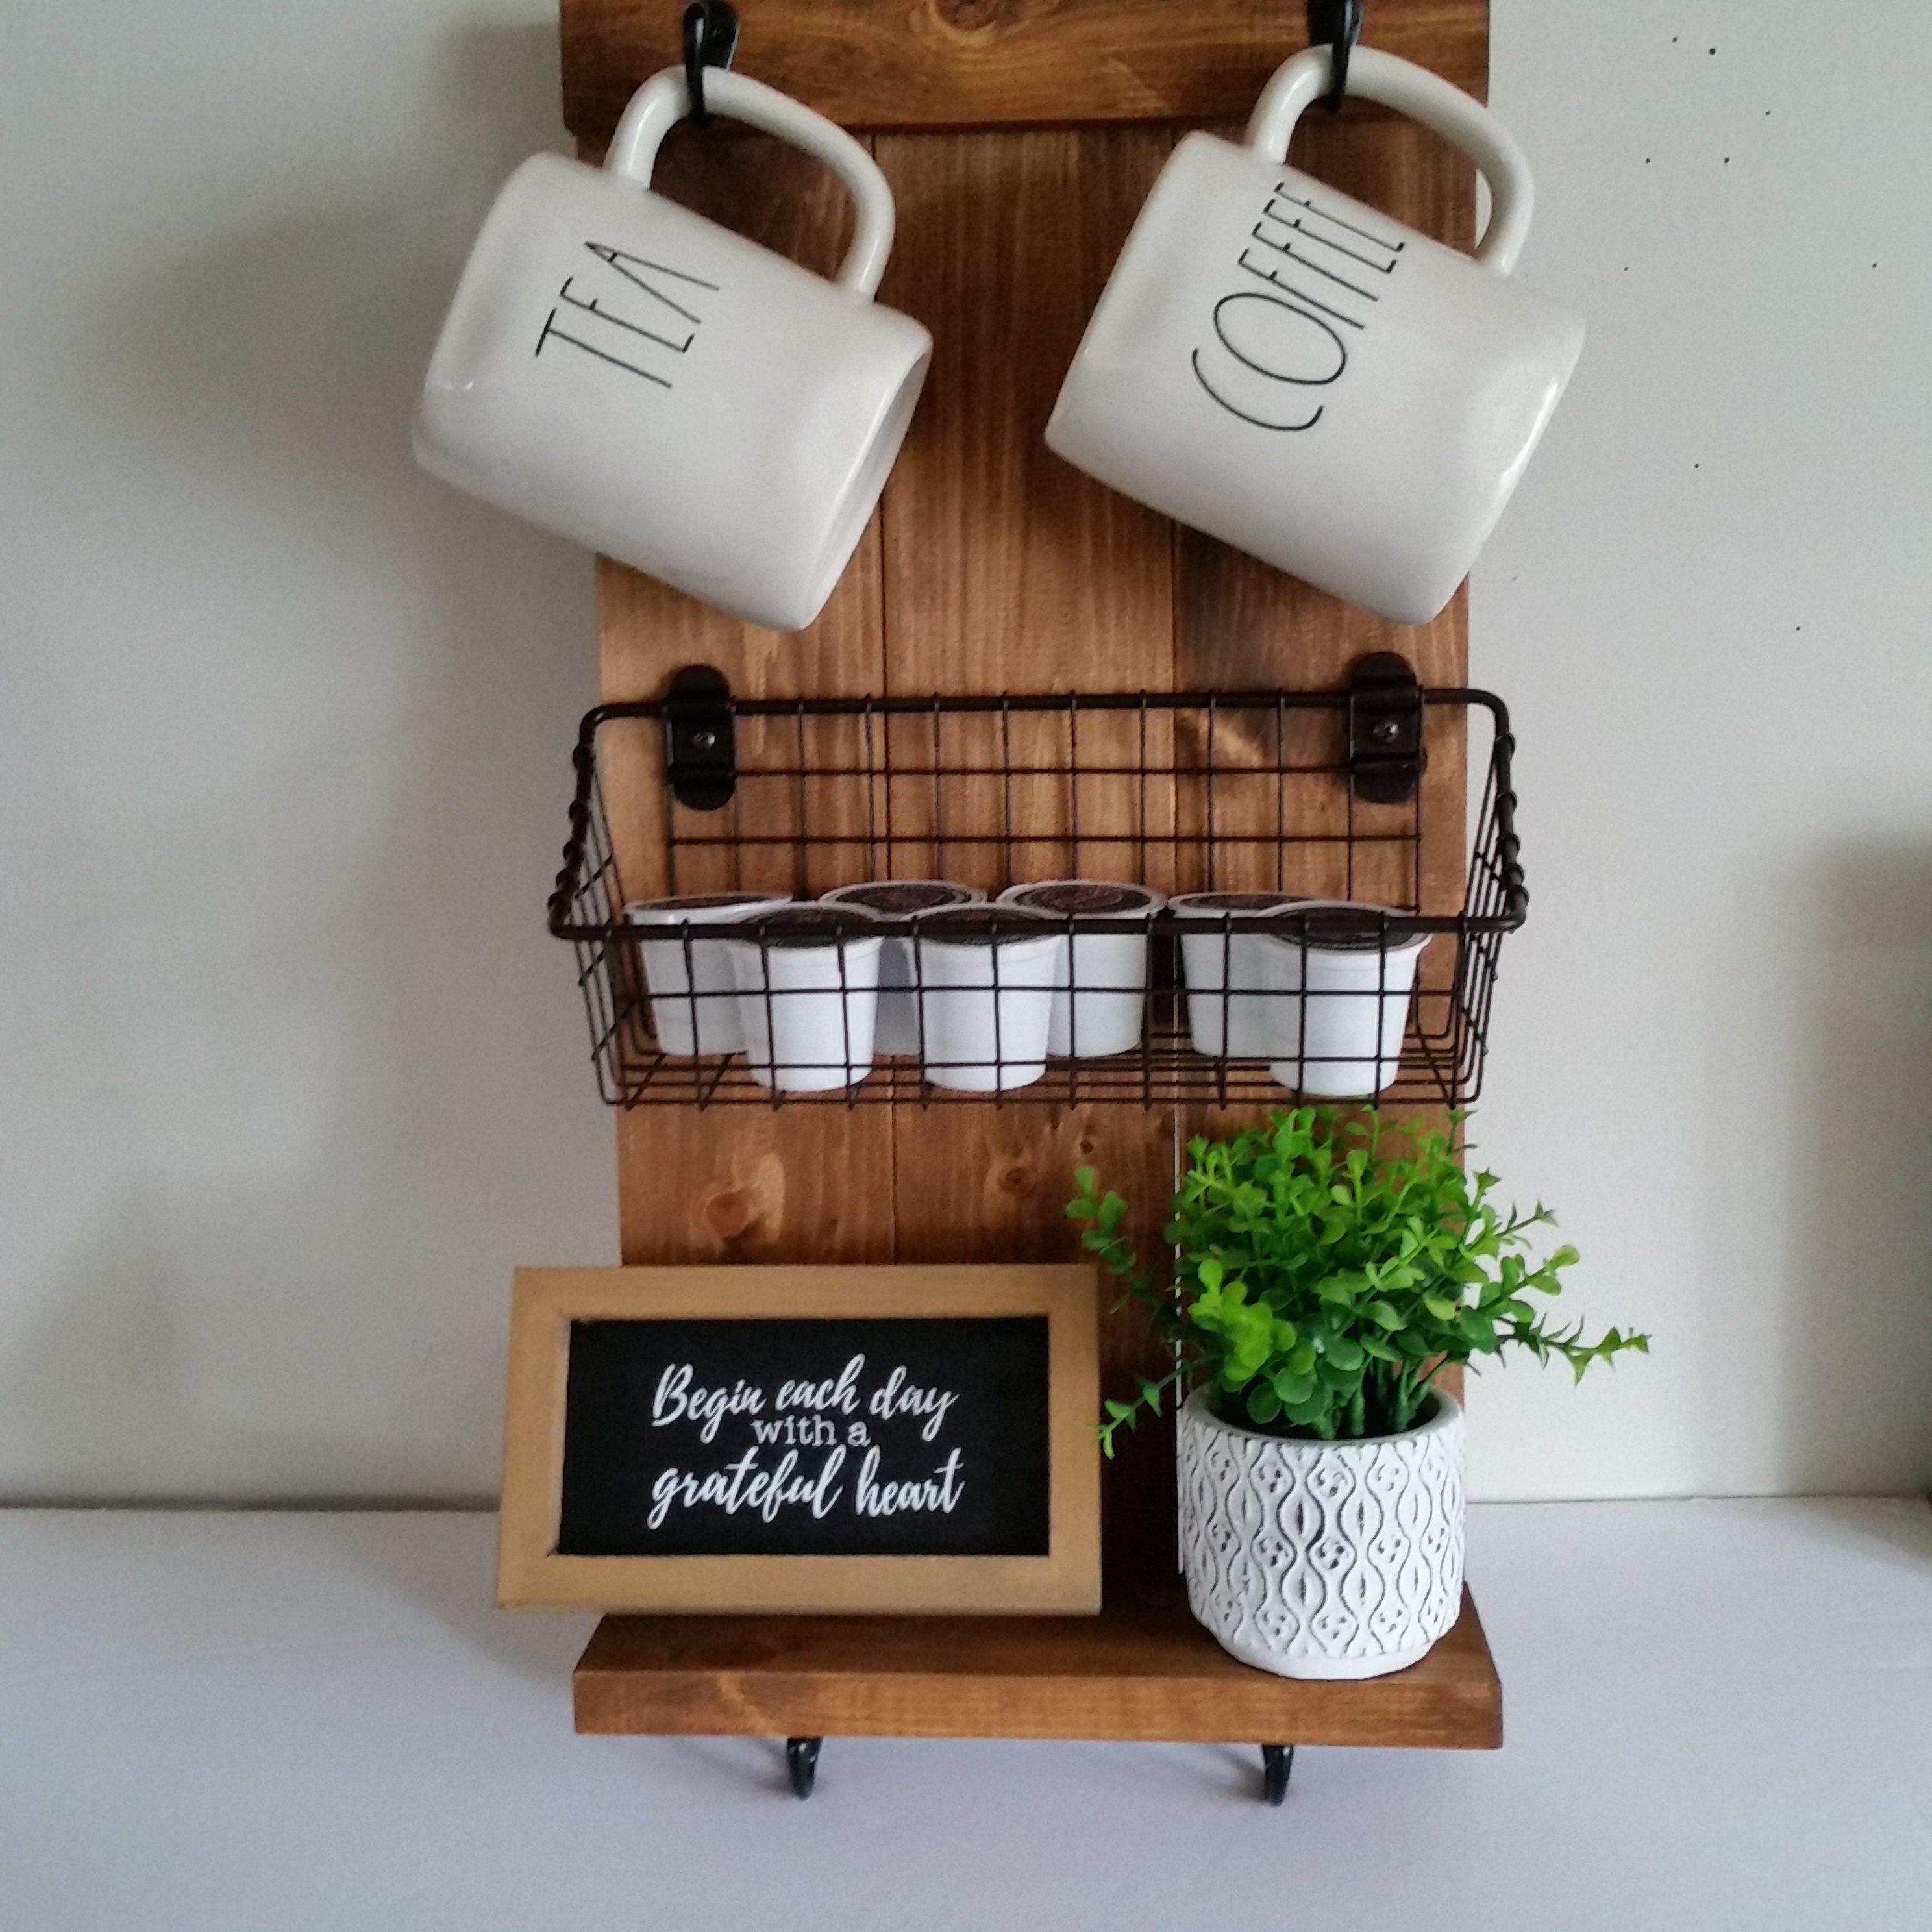 Pin on farmhouse coffee mug holder basket k cup holder